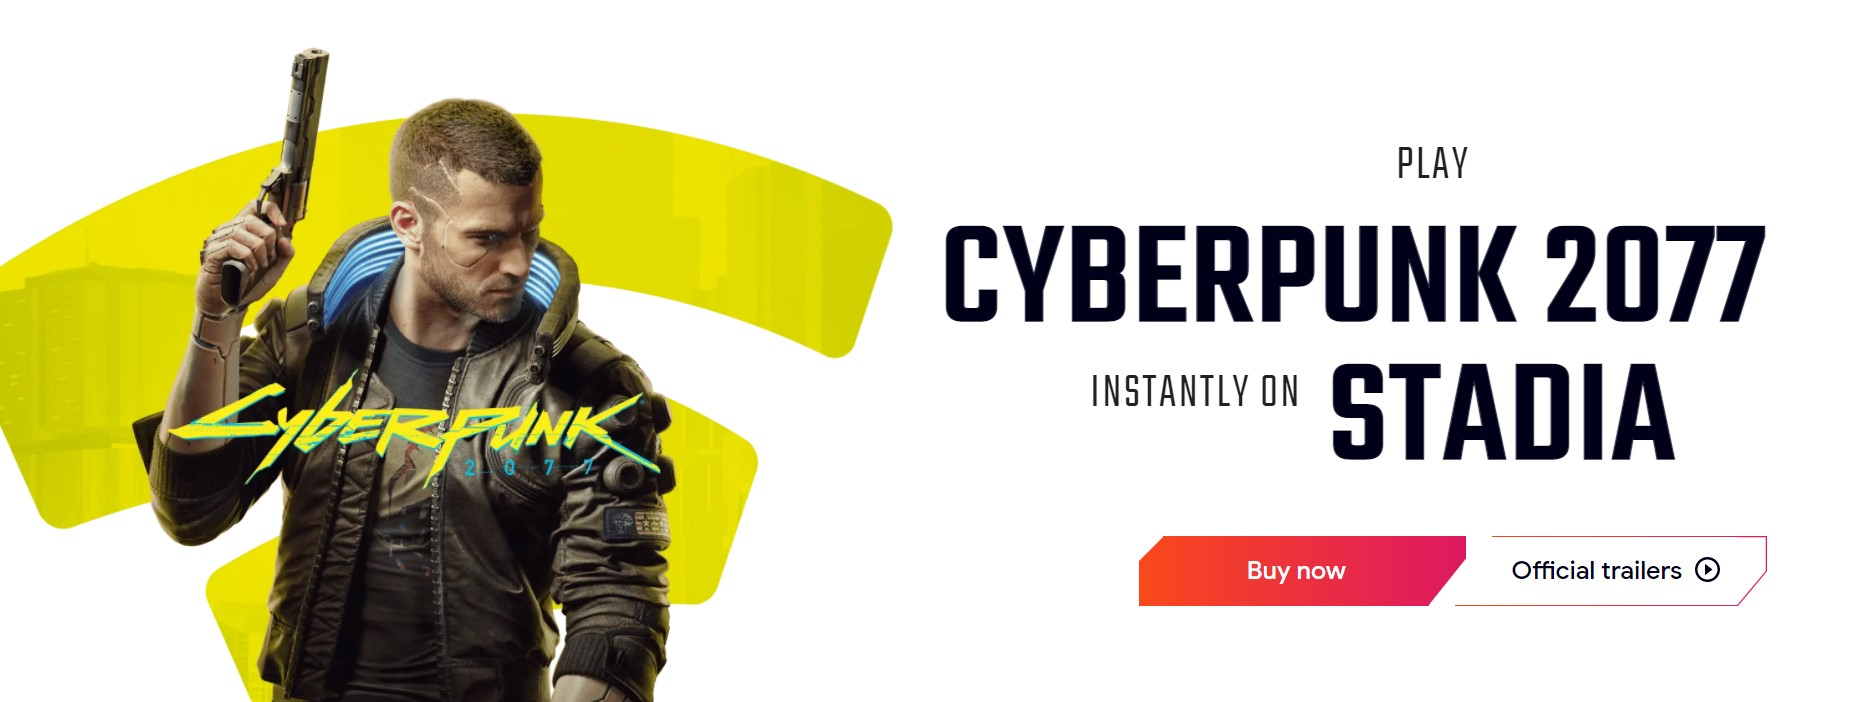 Cyberpunk 2077 Purchase Stadia